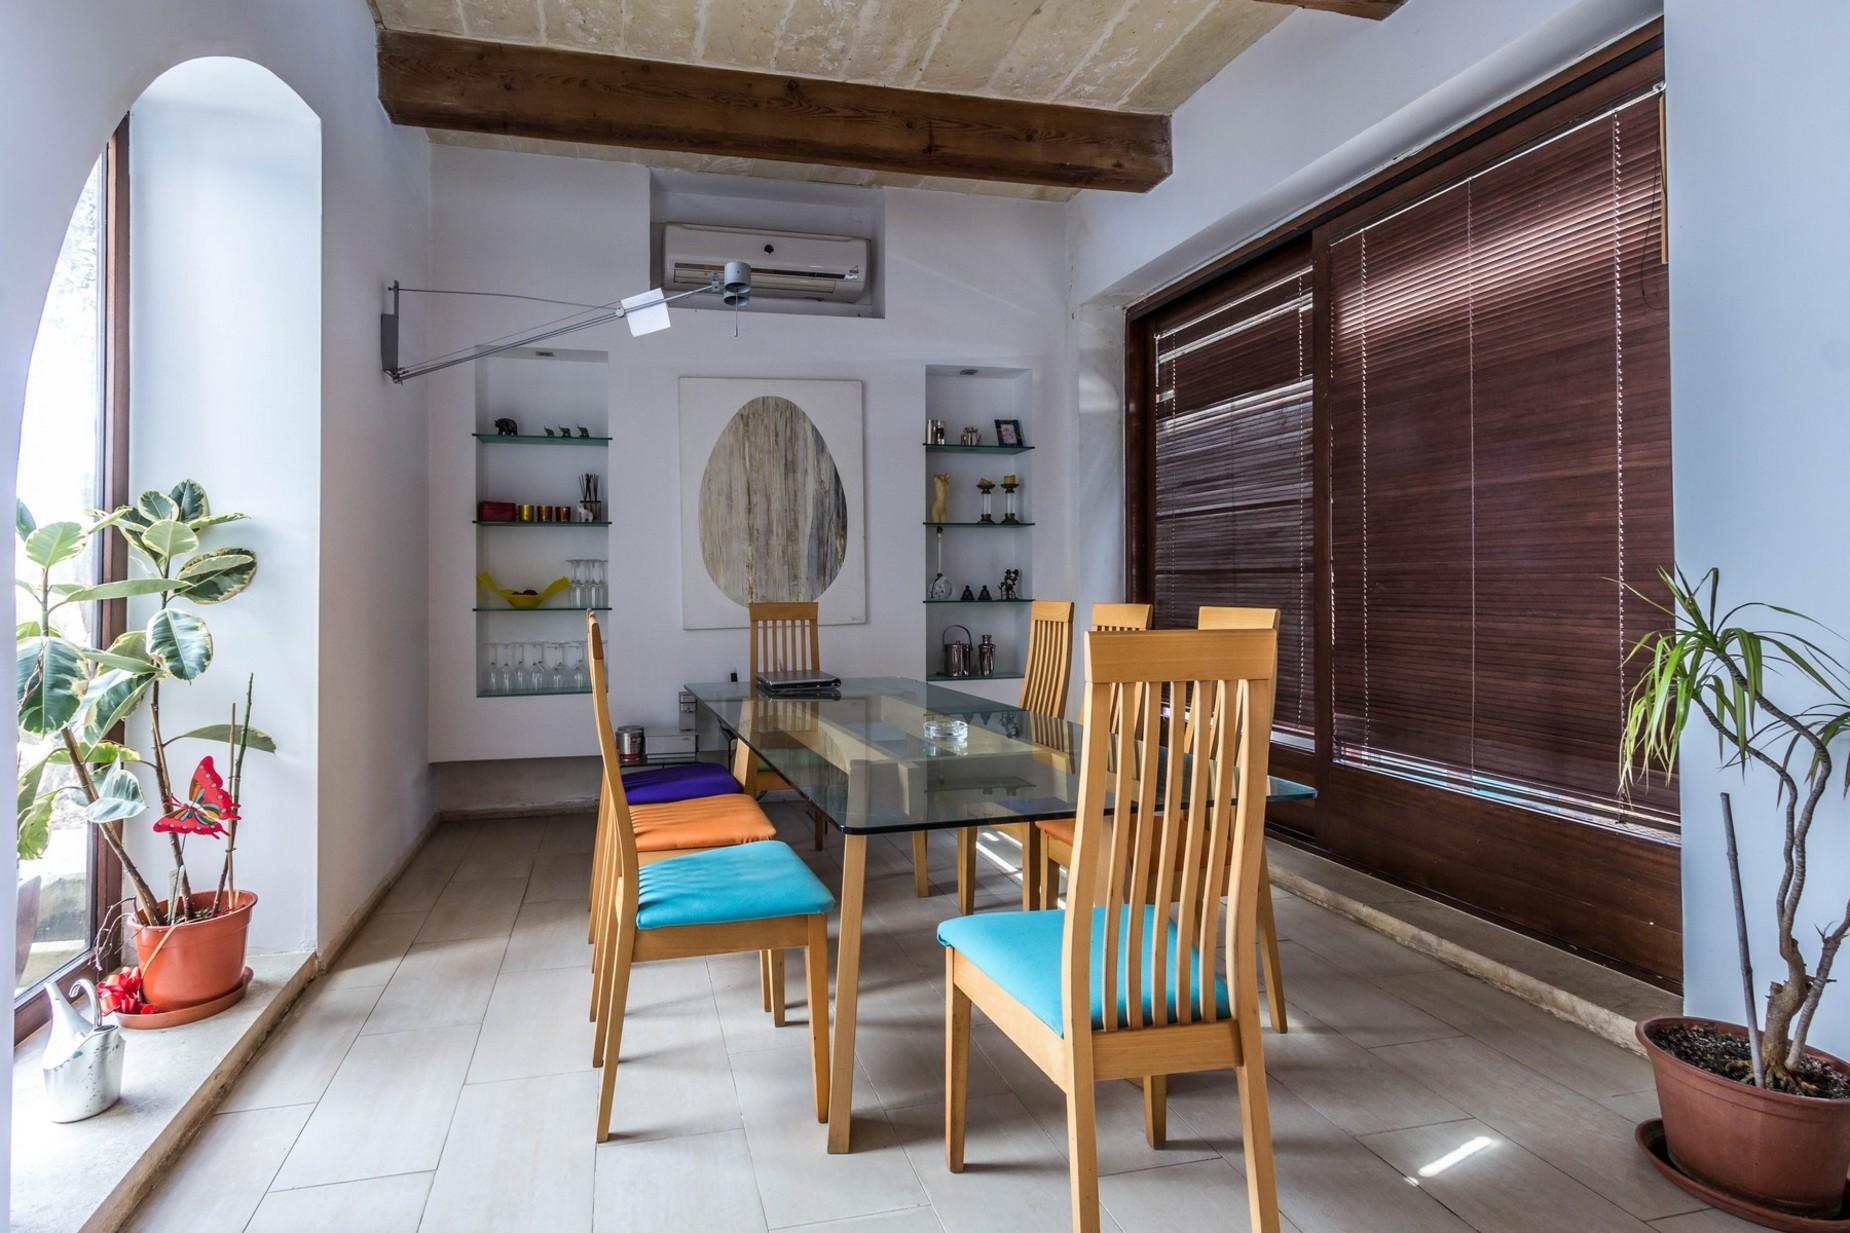 6 bed Farmhouse For Sale in Qala, Qala - thumb 5